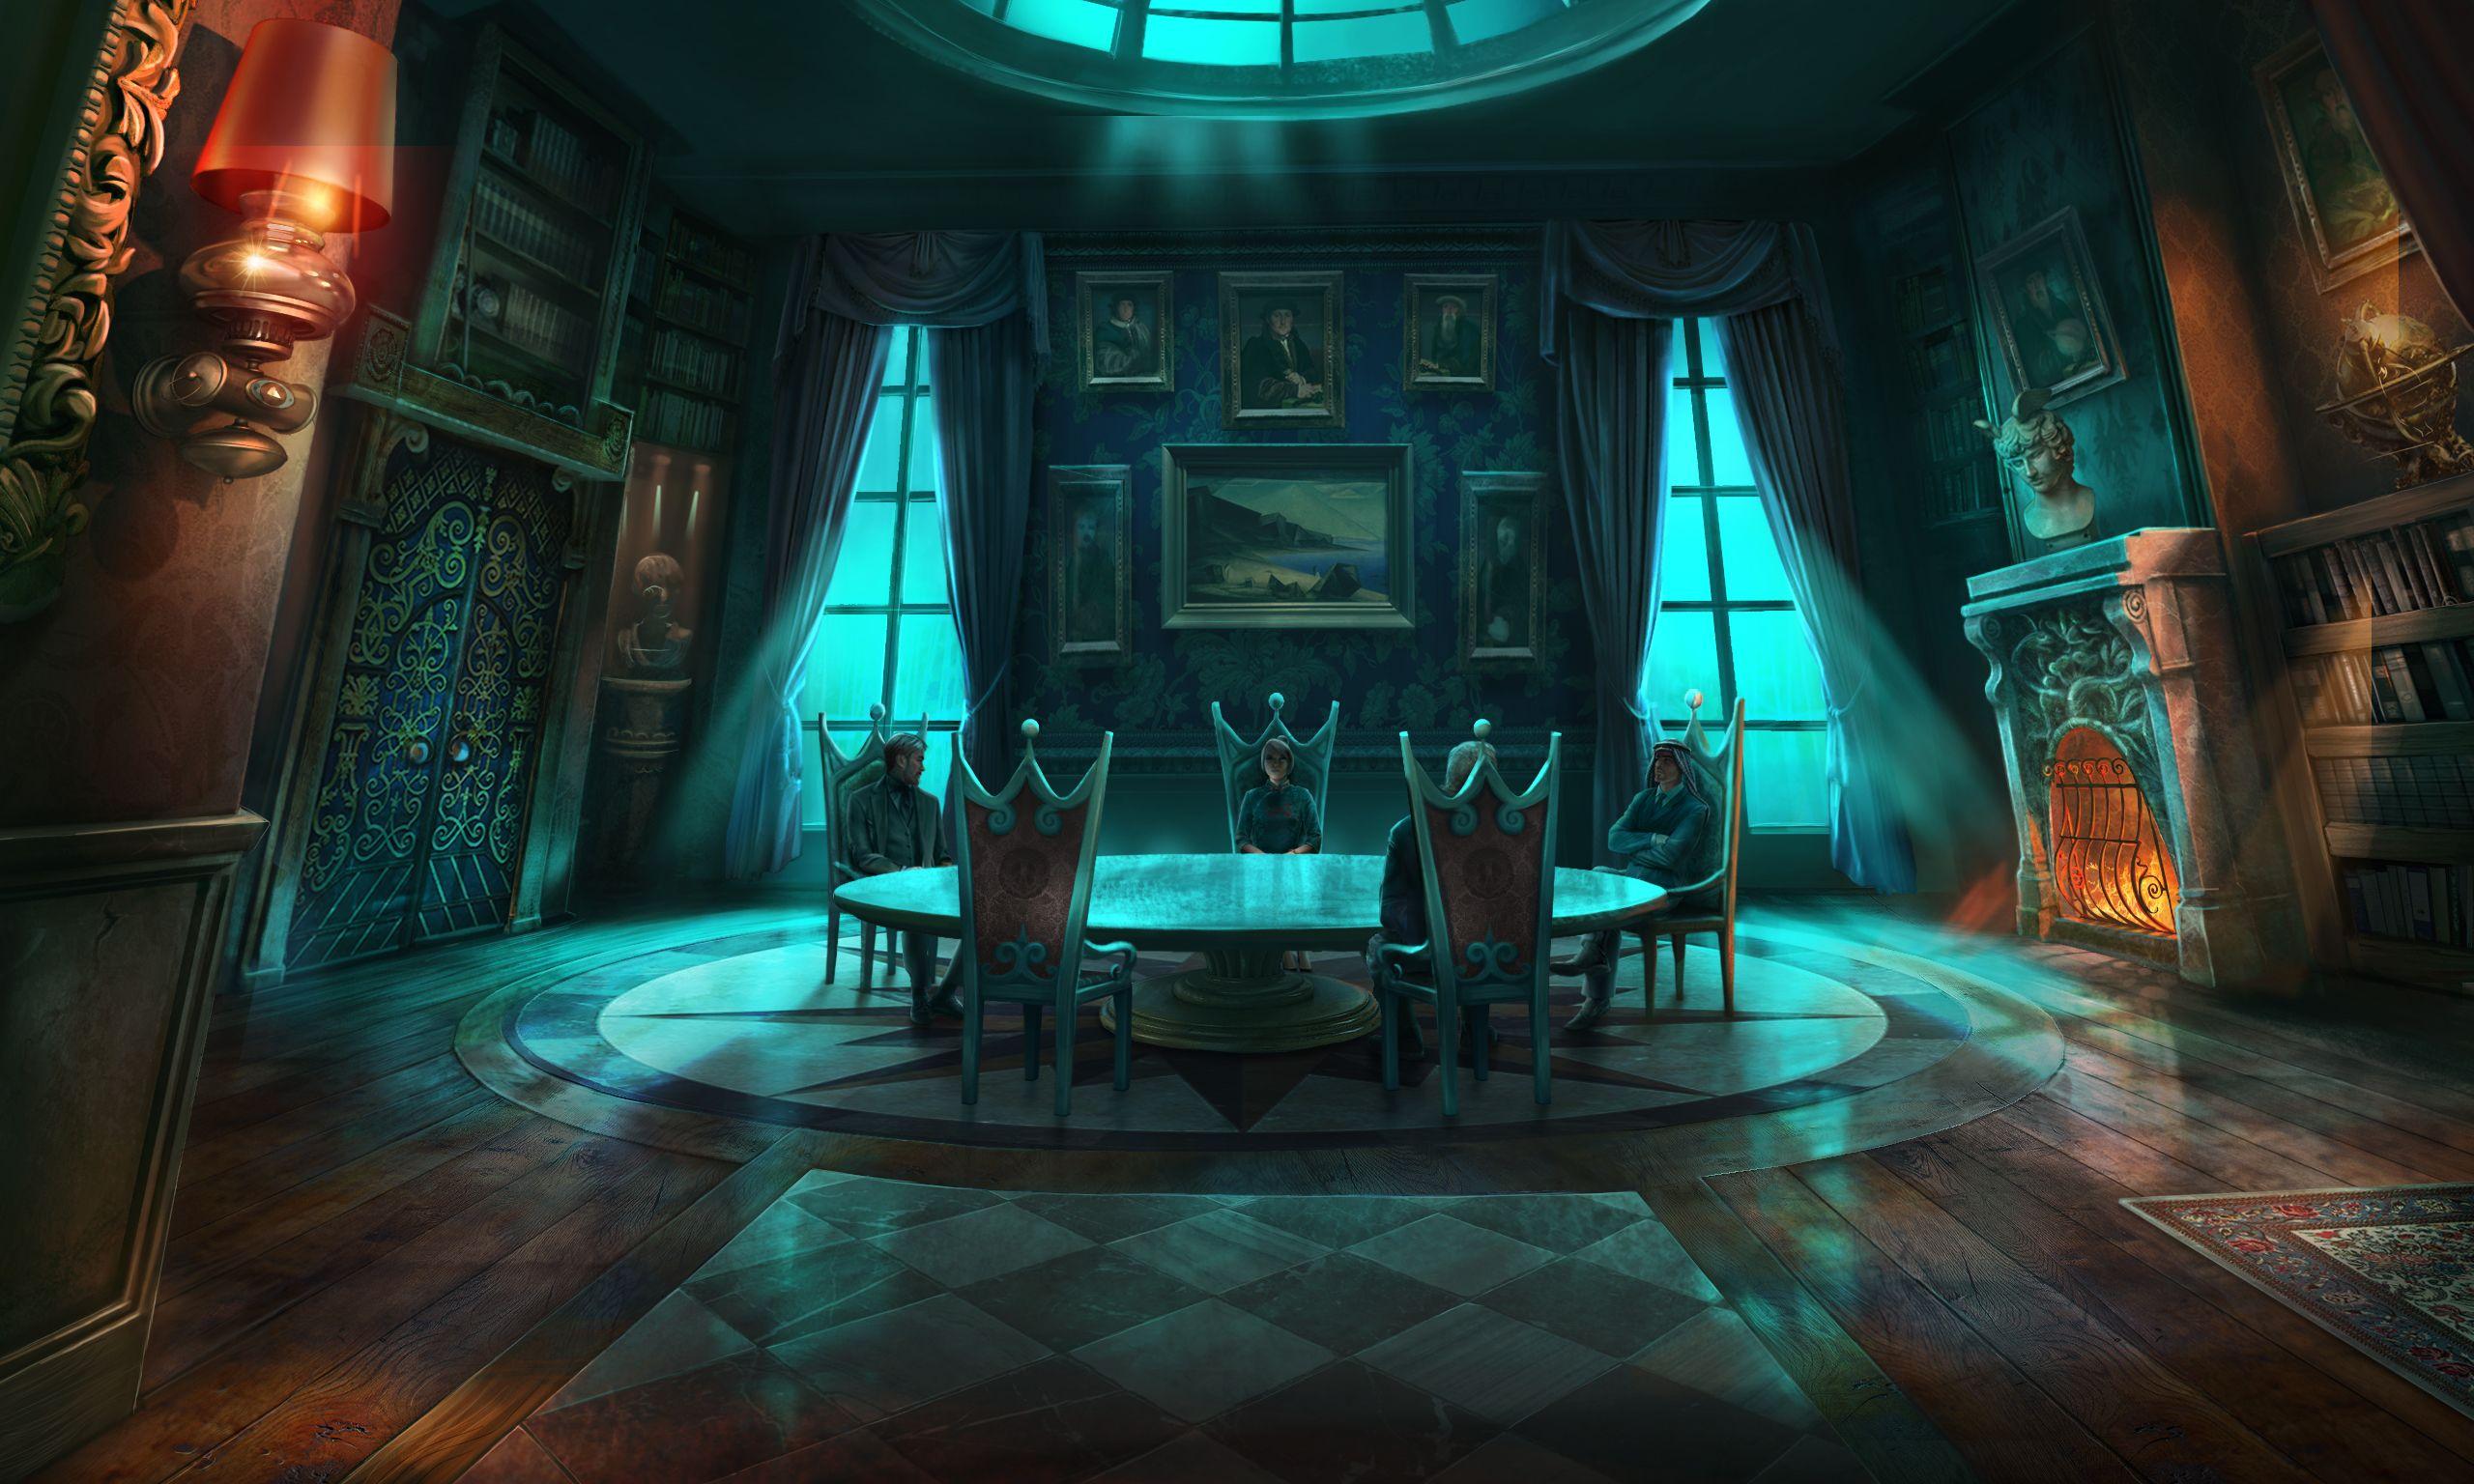 Dark Mansion Dining Room Fantasy Art Landscapes Anime Scenery